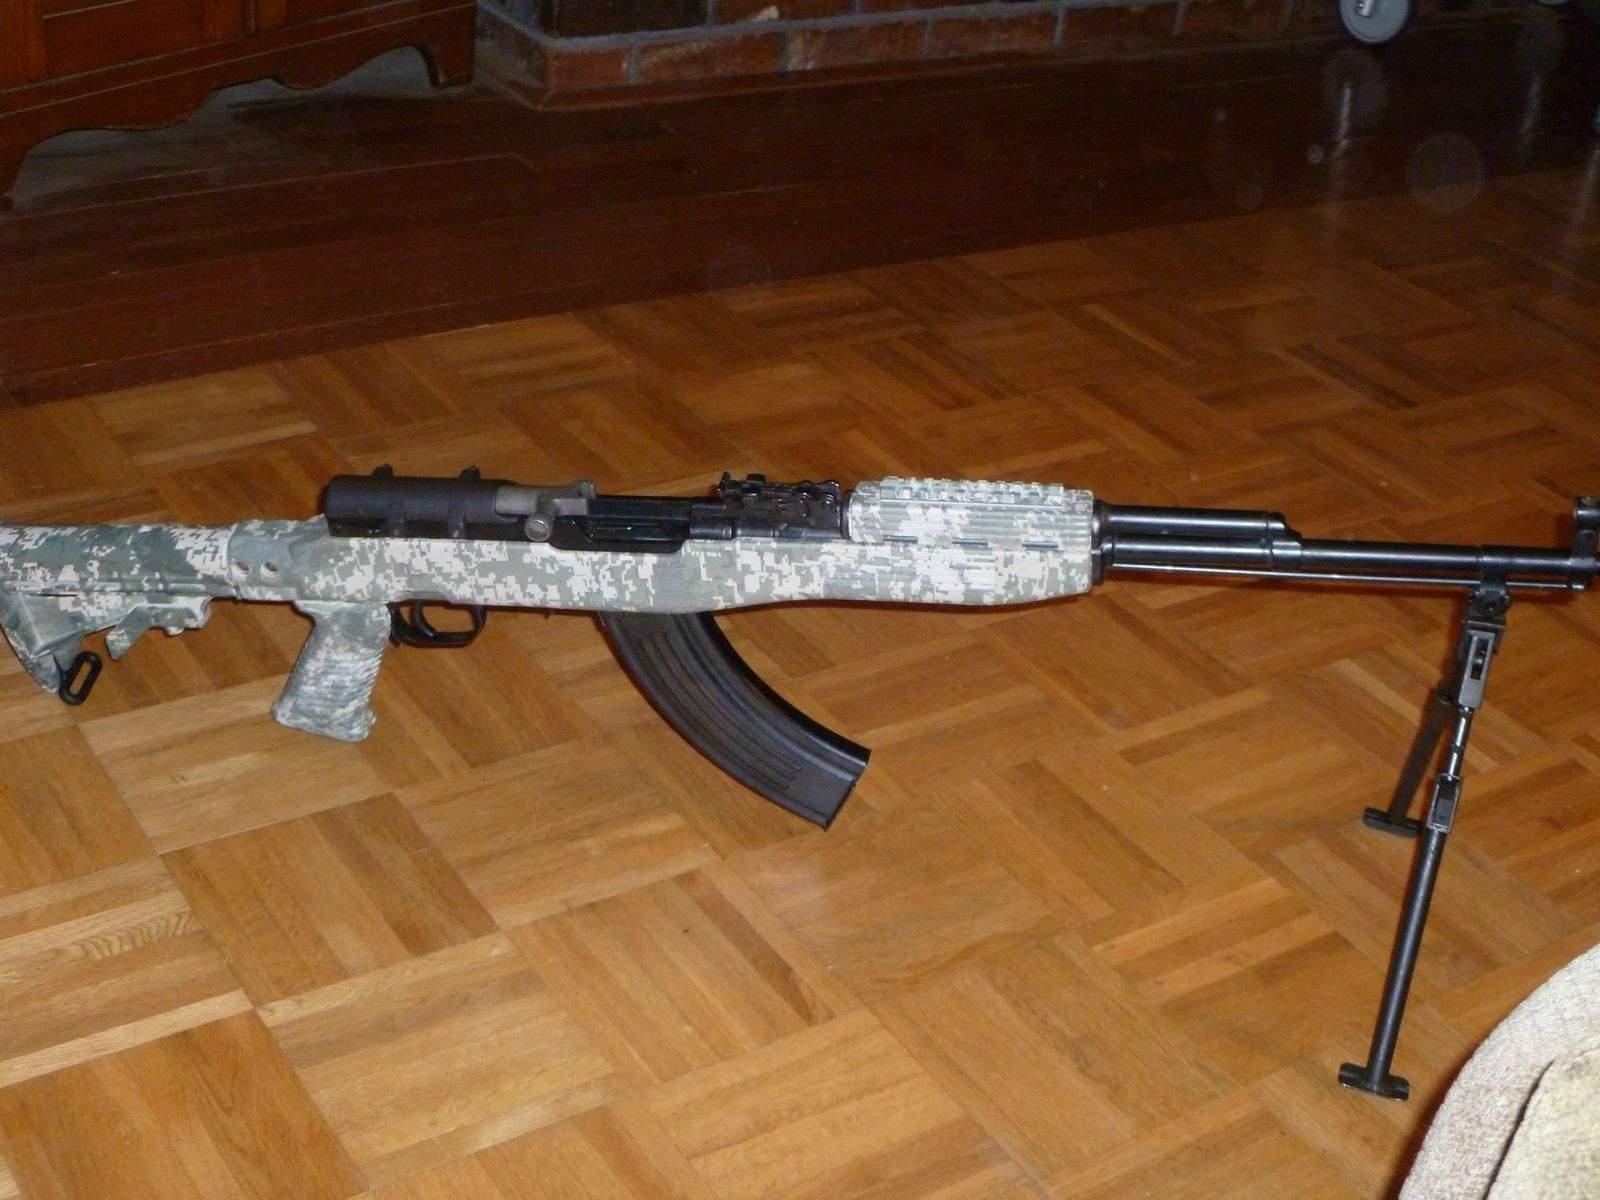 norinco sks tapco stock wtt | Northwest Firearms - Oregon